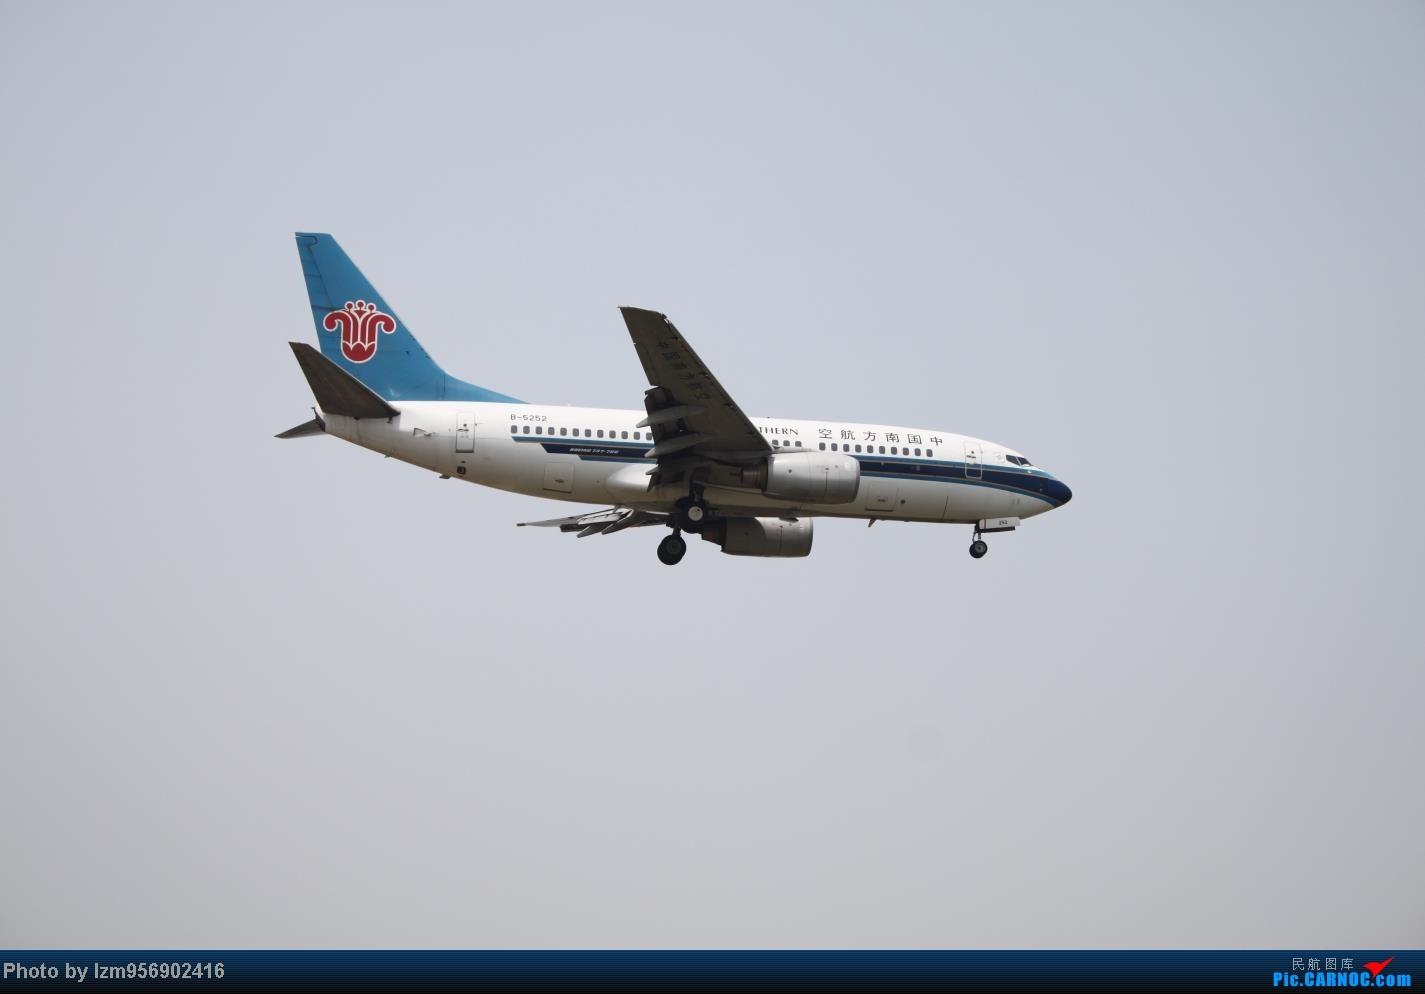 Re:[原创]DLC蹲点大半天,拍到了大棒航空772=w= BOEING 737-700 B-5252 中国大连周水子机场